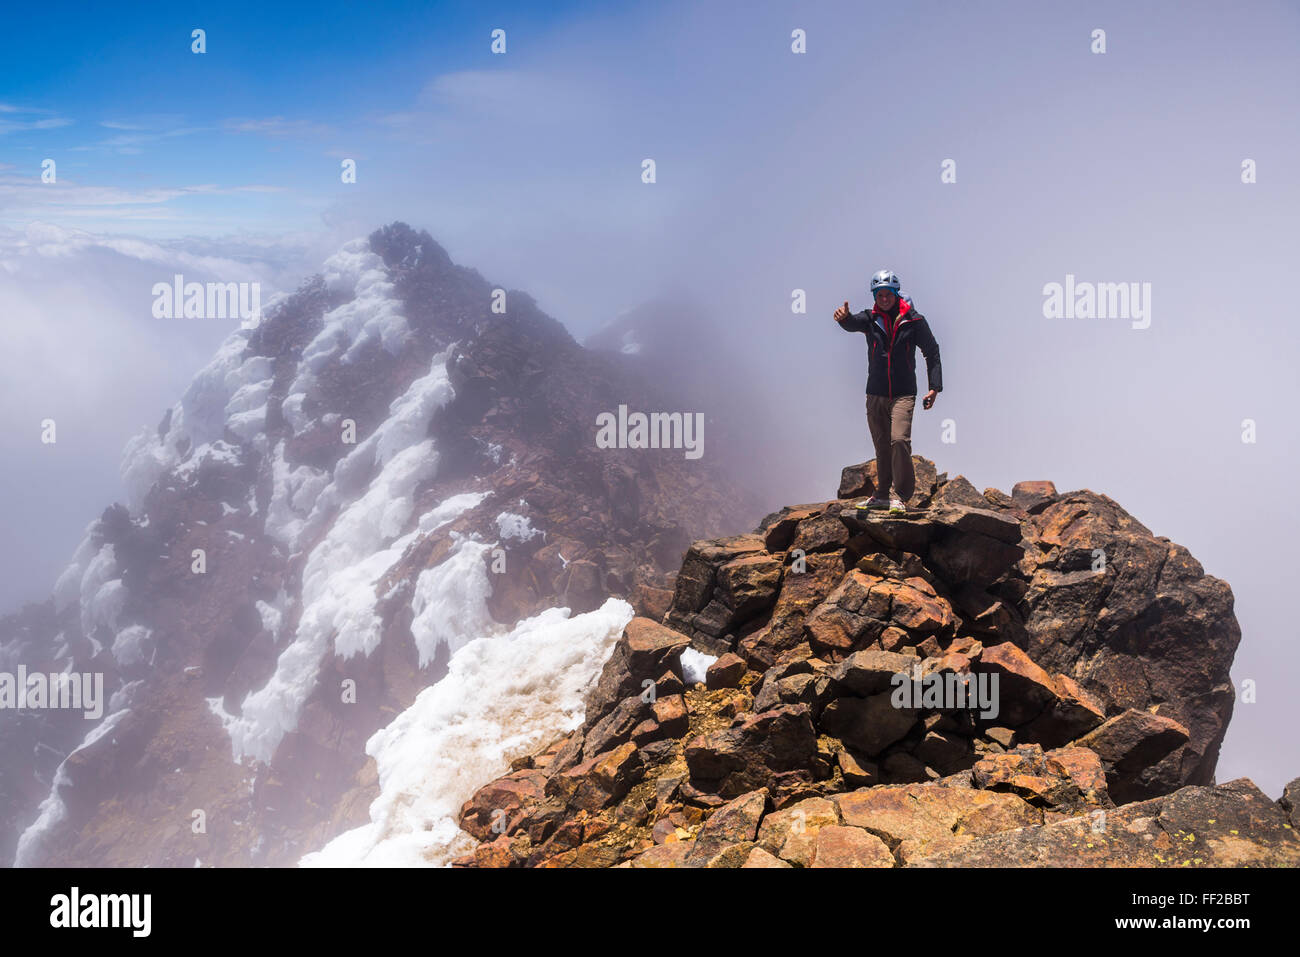 5126m Gipfel des IRMRMiniza Norte VoRMcano, Provinz Pichincha, Ecuador, Südamerika Stockfoto